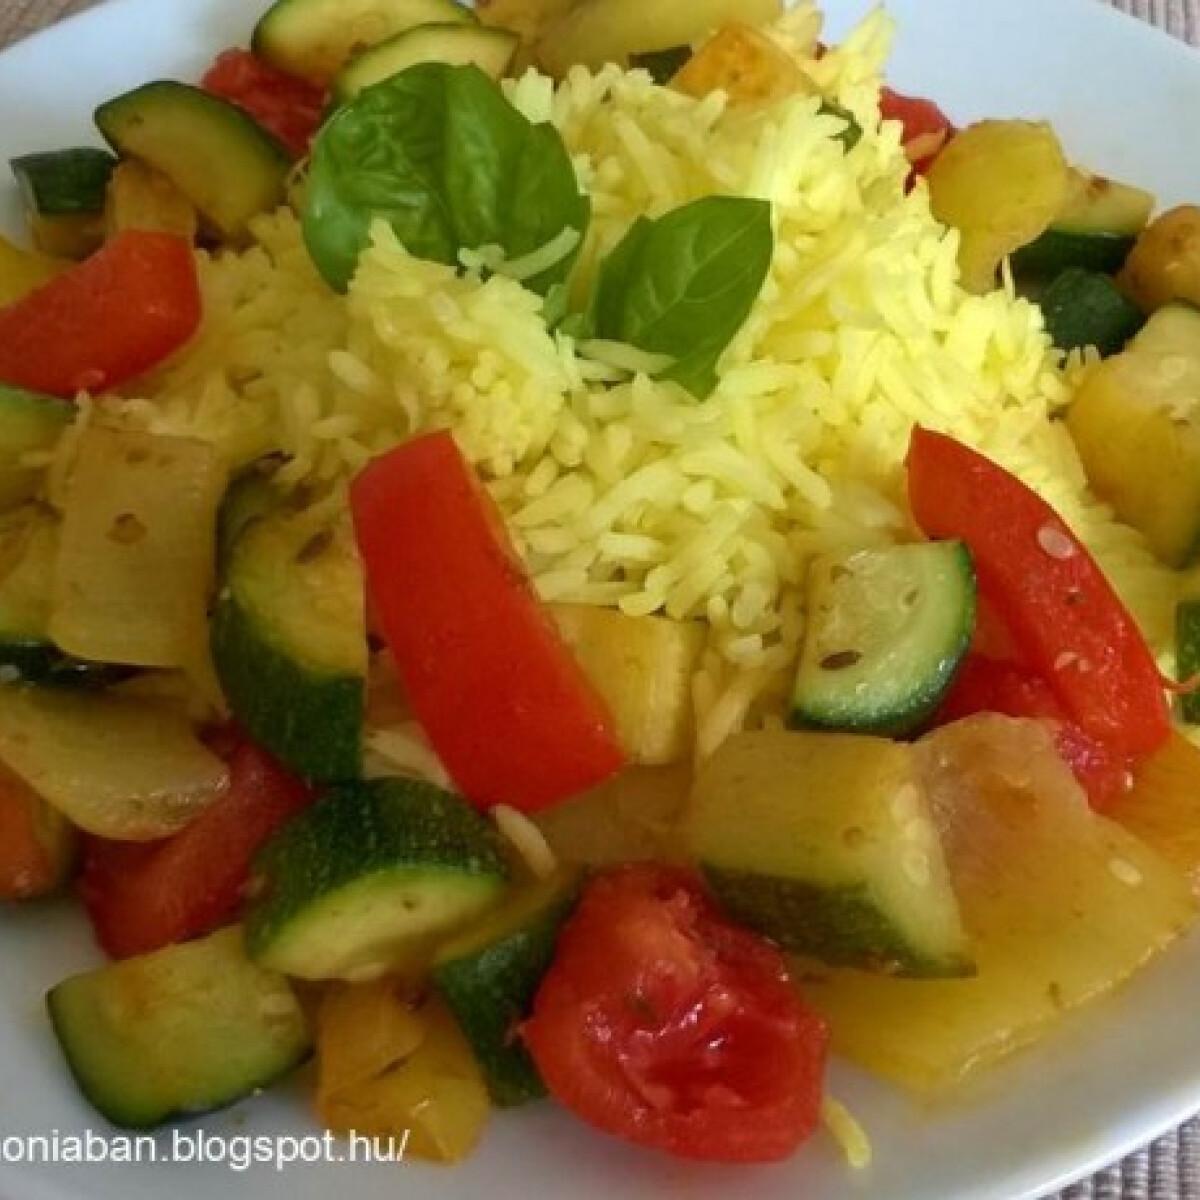 Cukkini-paprika-paradicsom - könnyű és gyors vacsora